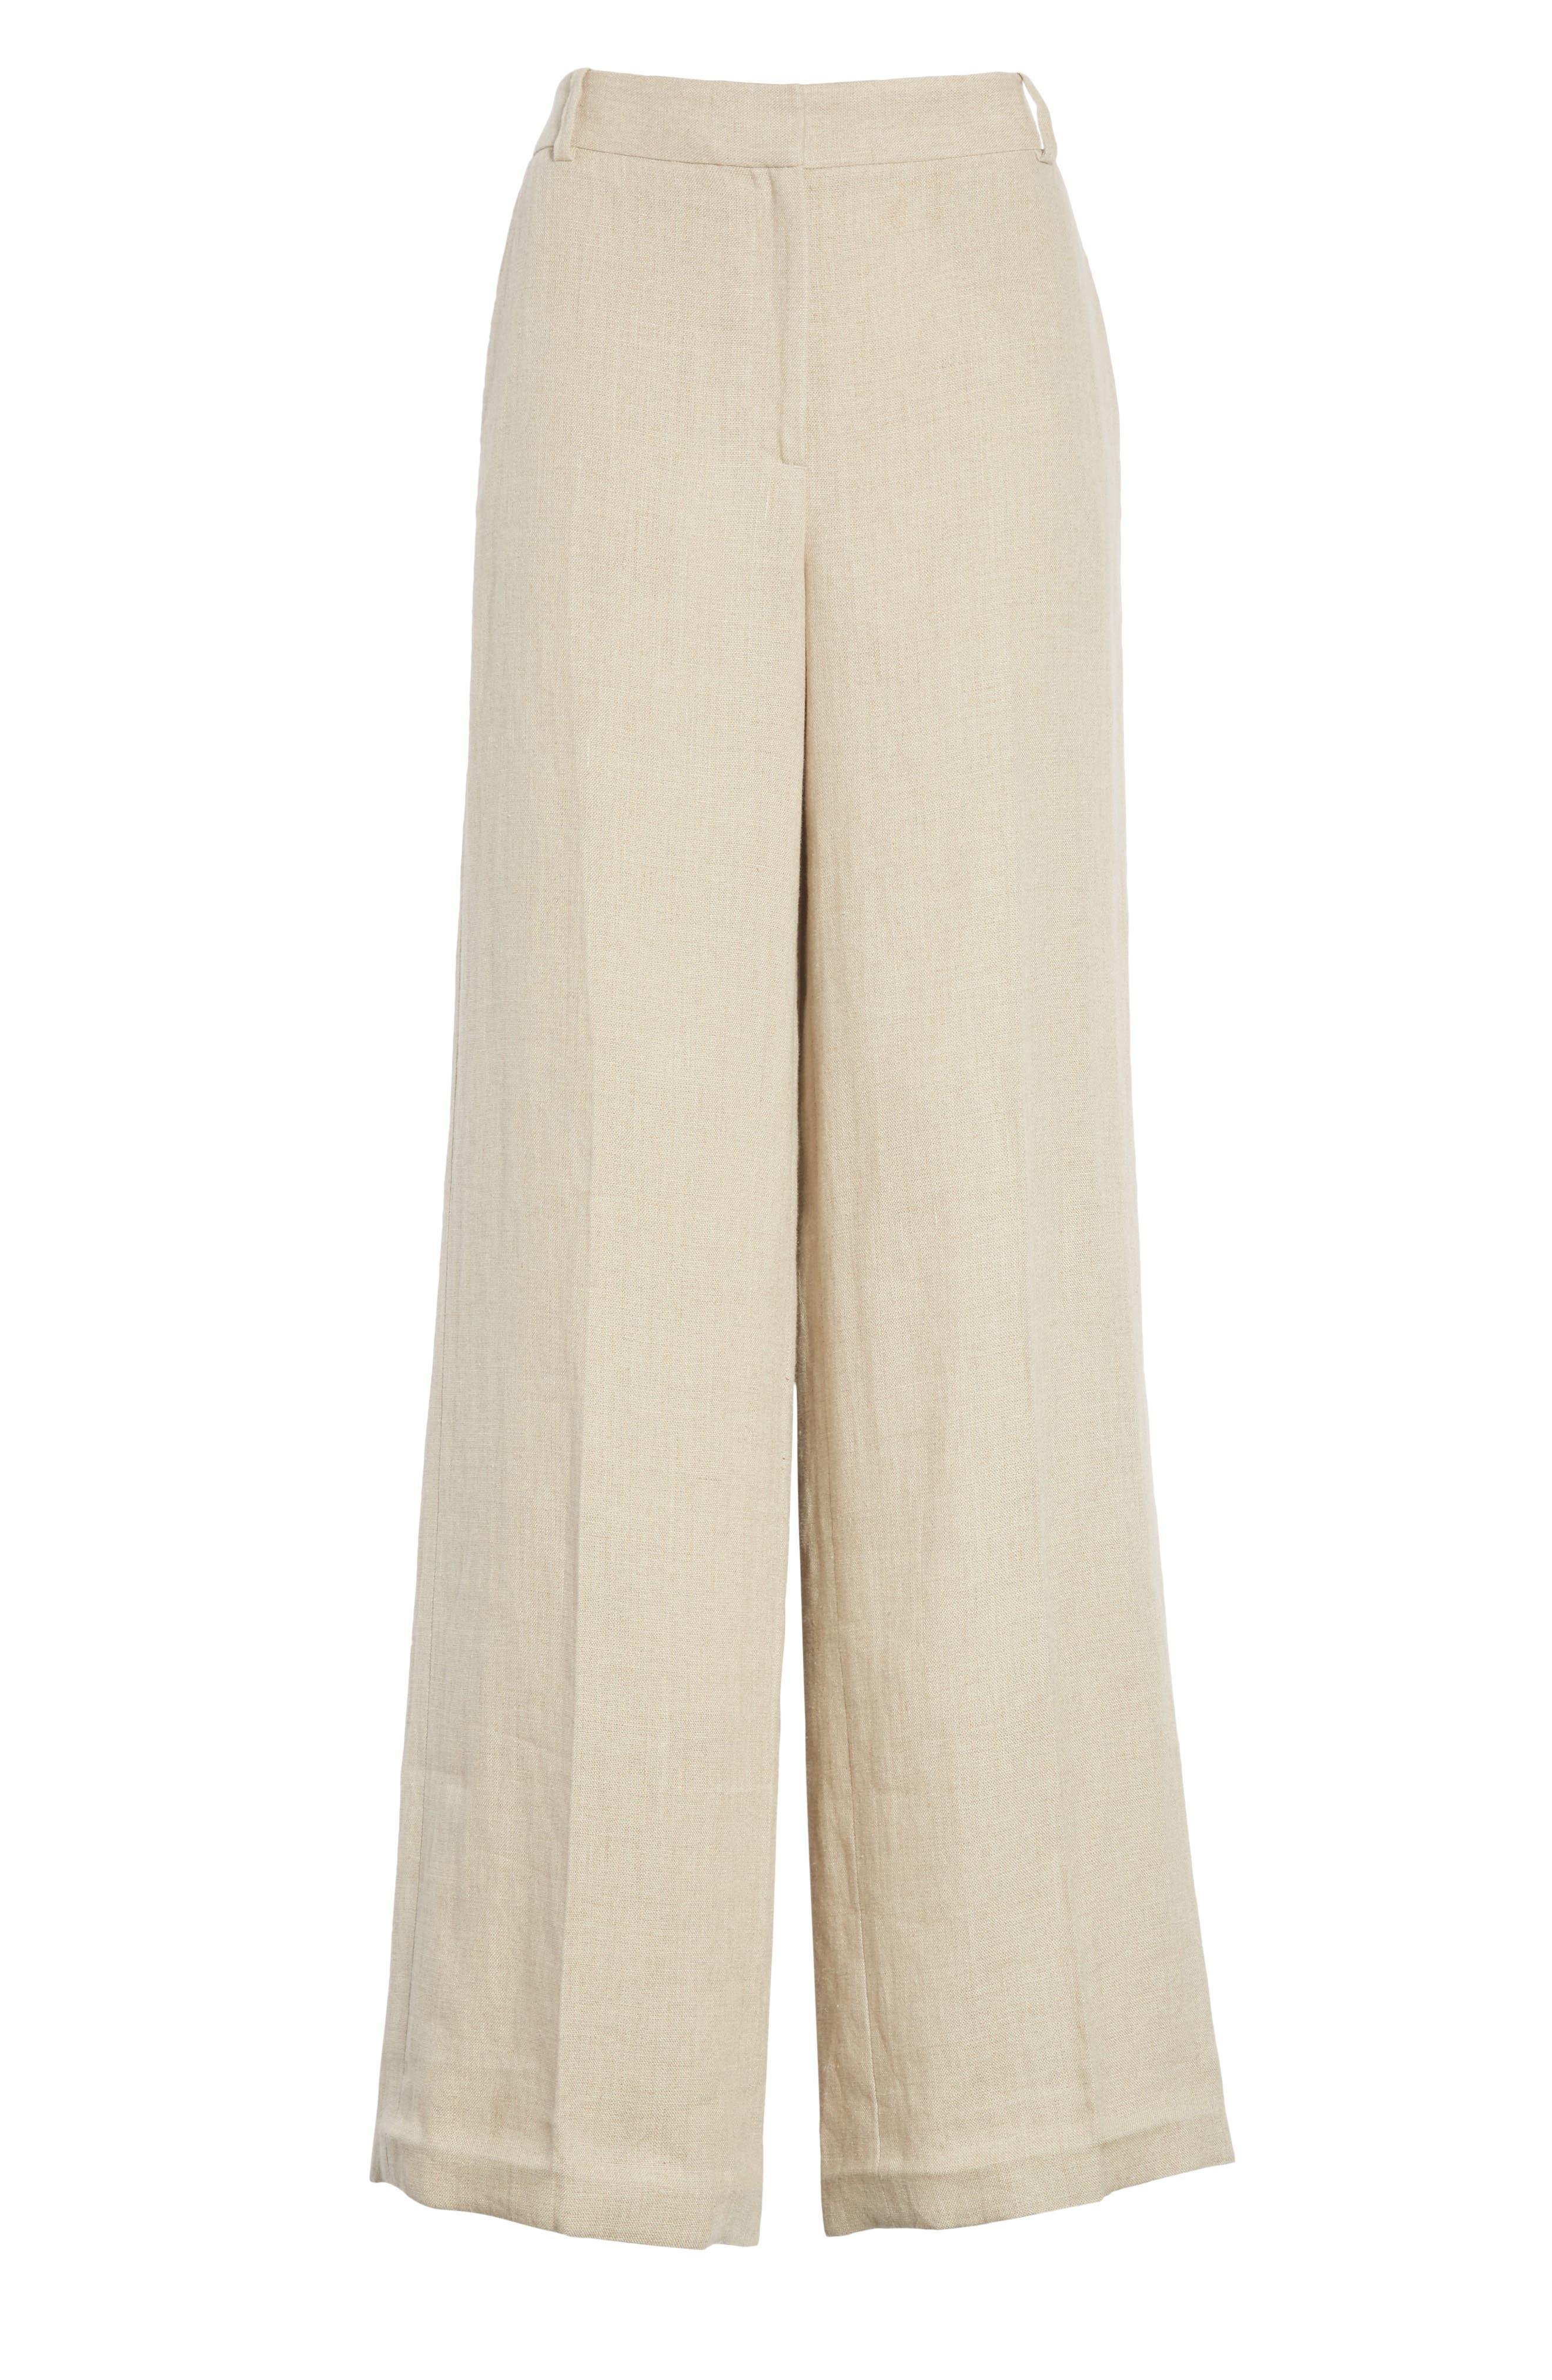 Piazza Integrate Wide Leg Linen Pants,                             Alternate thumbnail 6, color,                             250